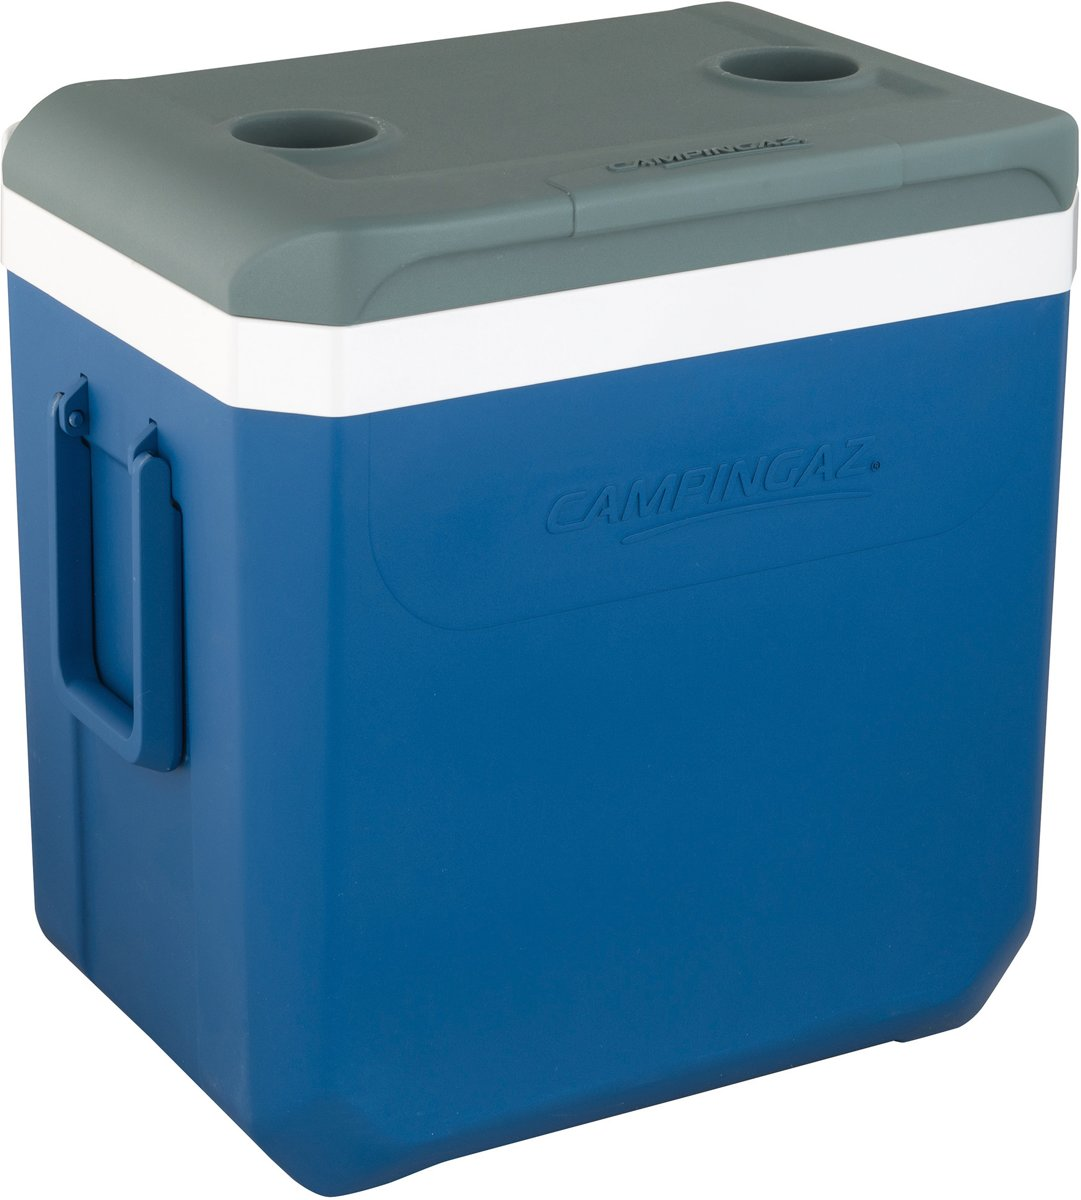 Campingaz Koelbox - Icetime Plus Extreme - 37 Liter - Blauw kopen